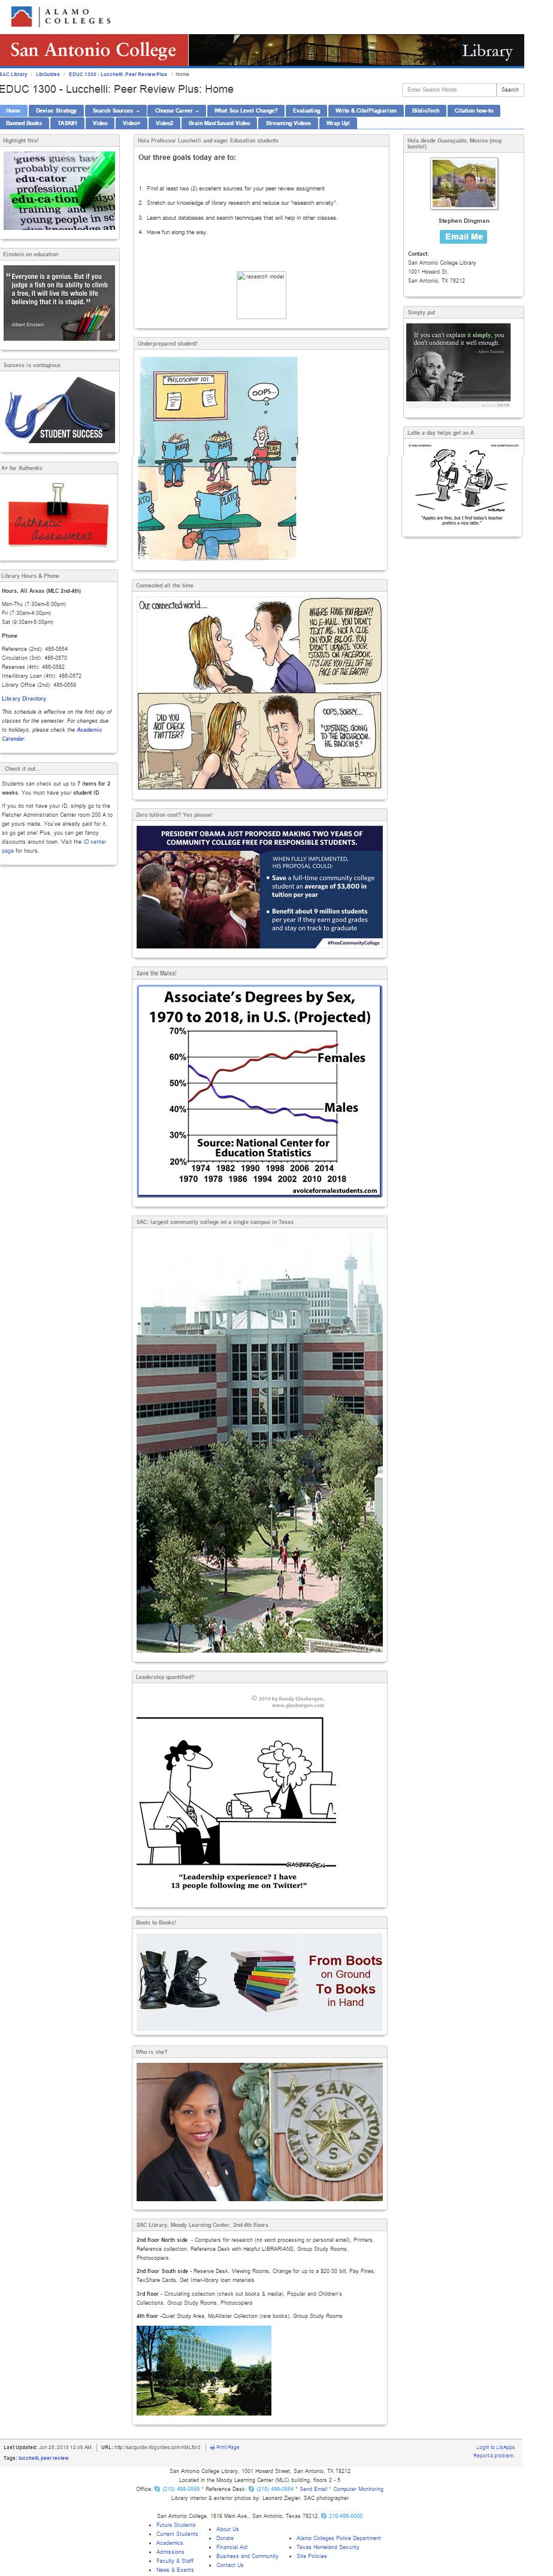 Reference - San Antonio college